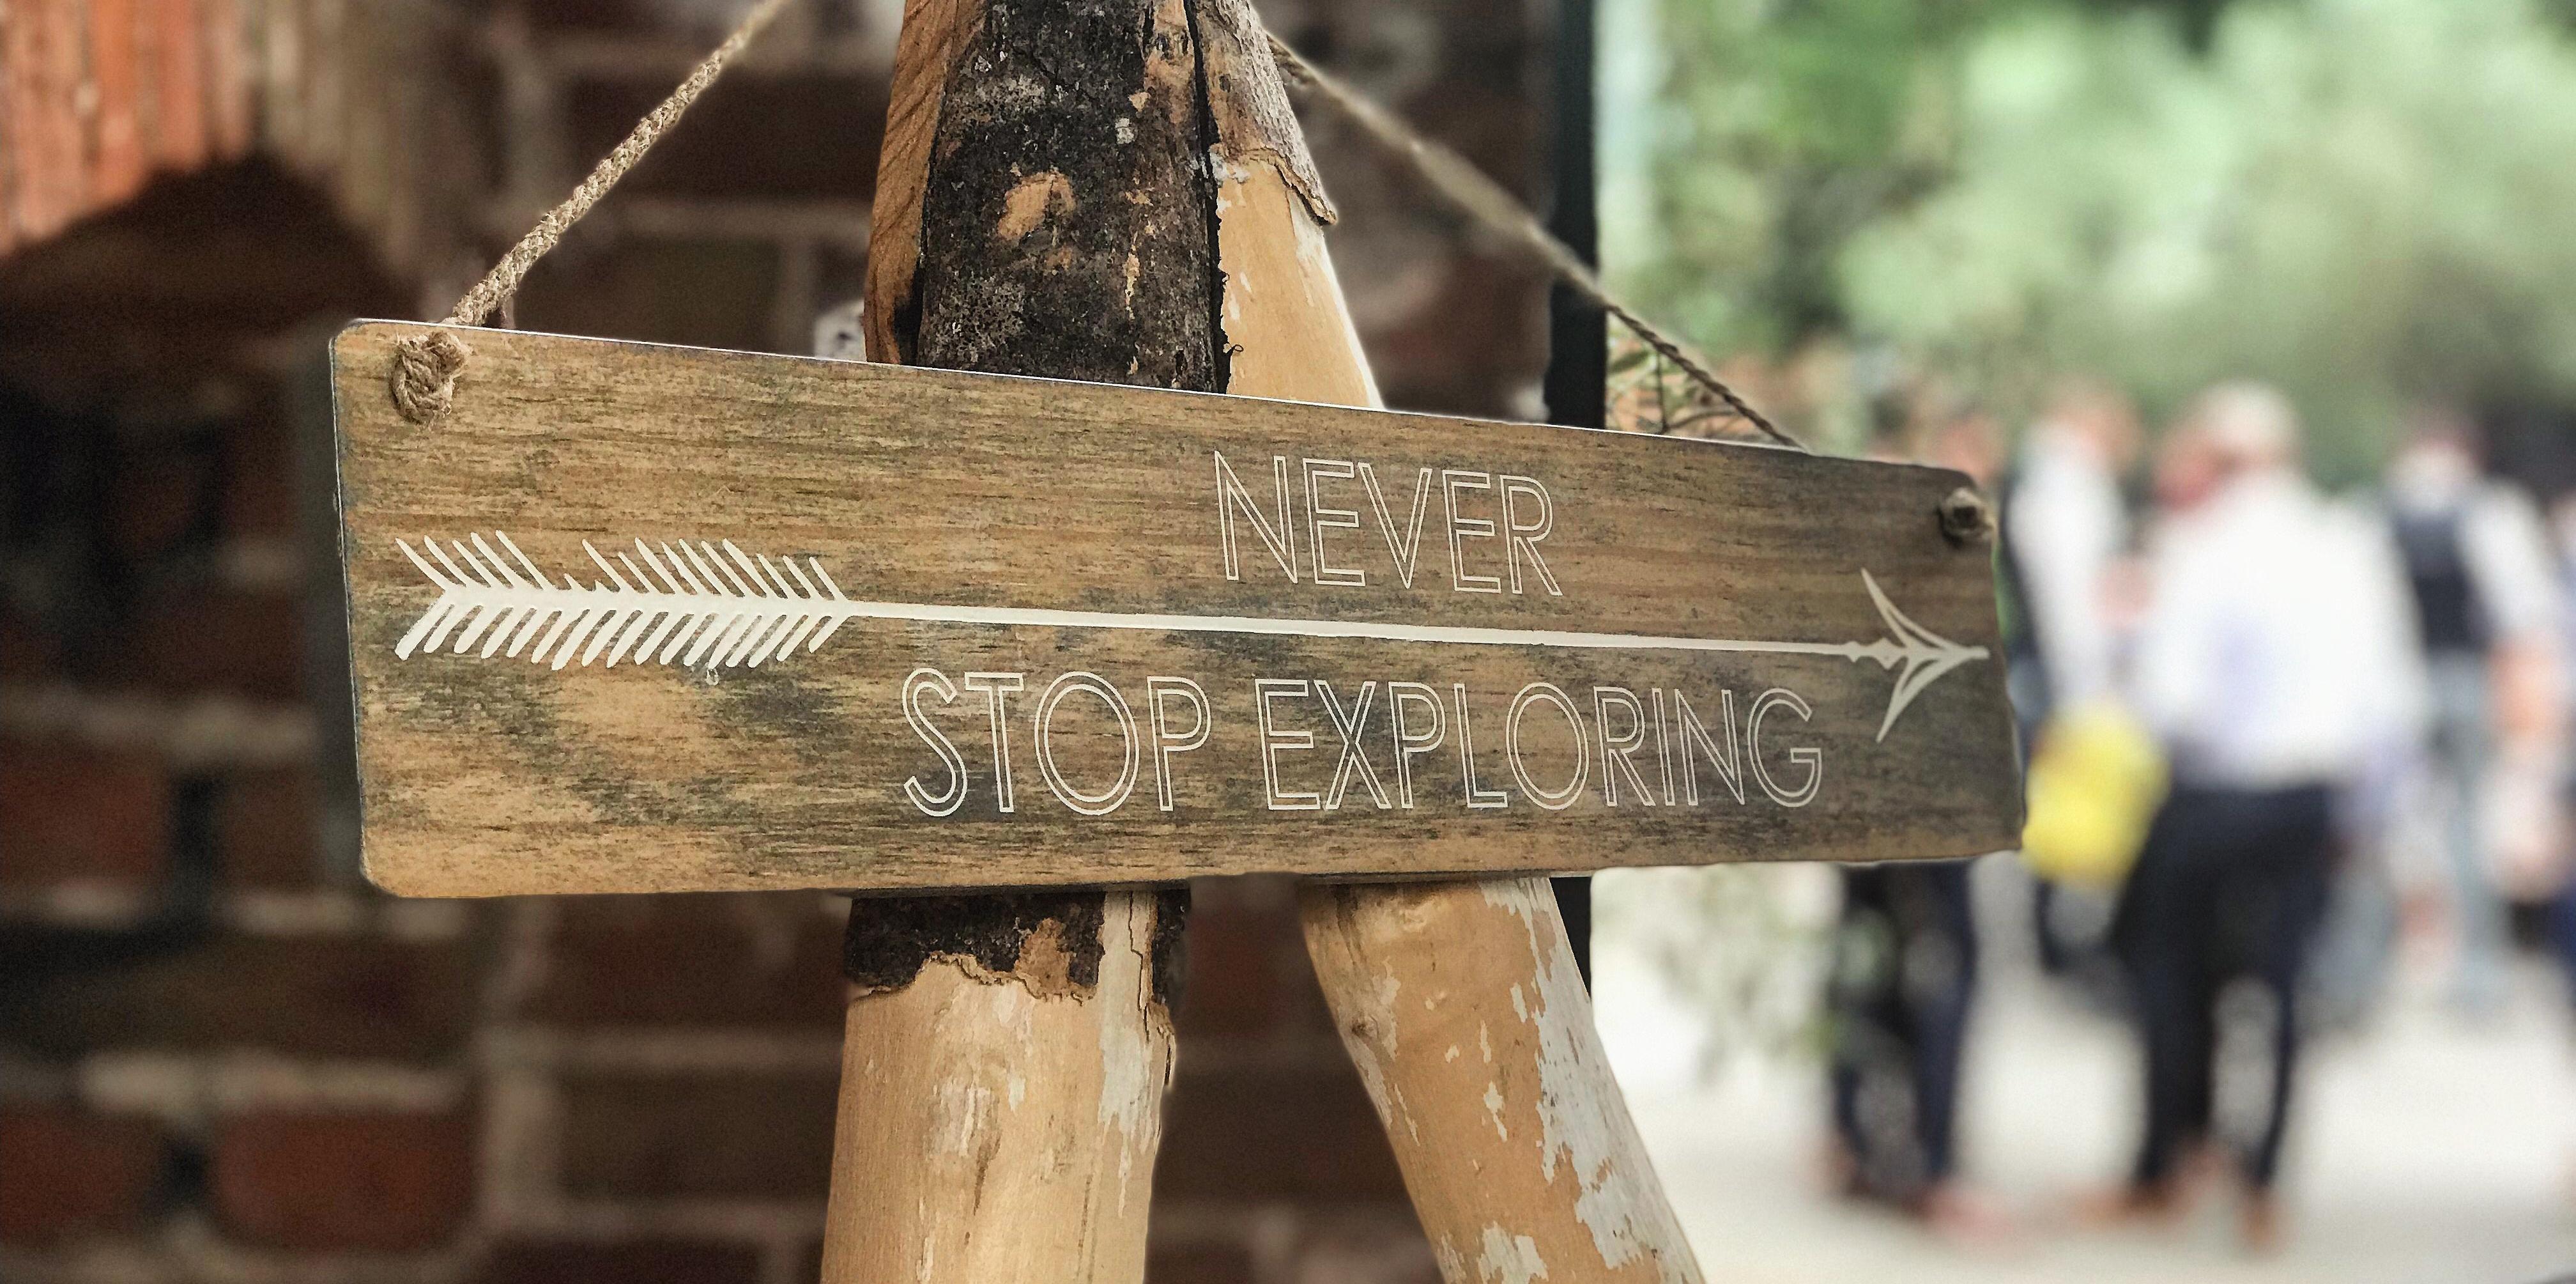 never-stop-exploring-signboard-954662.jp